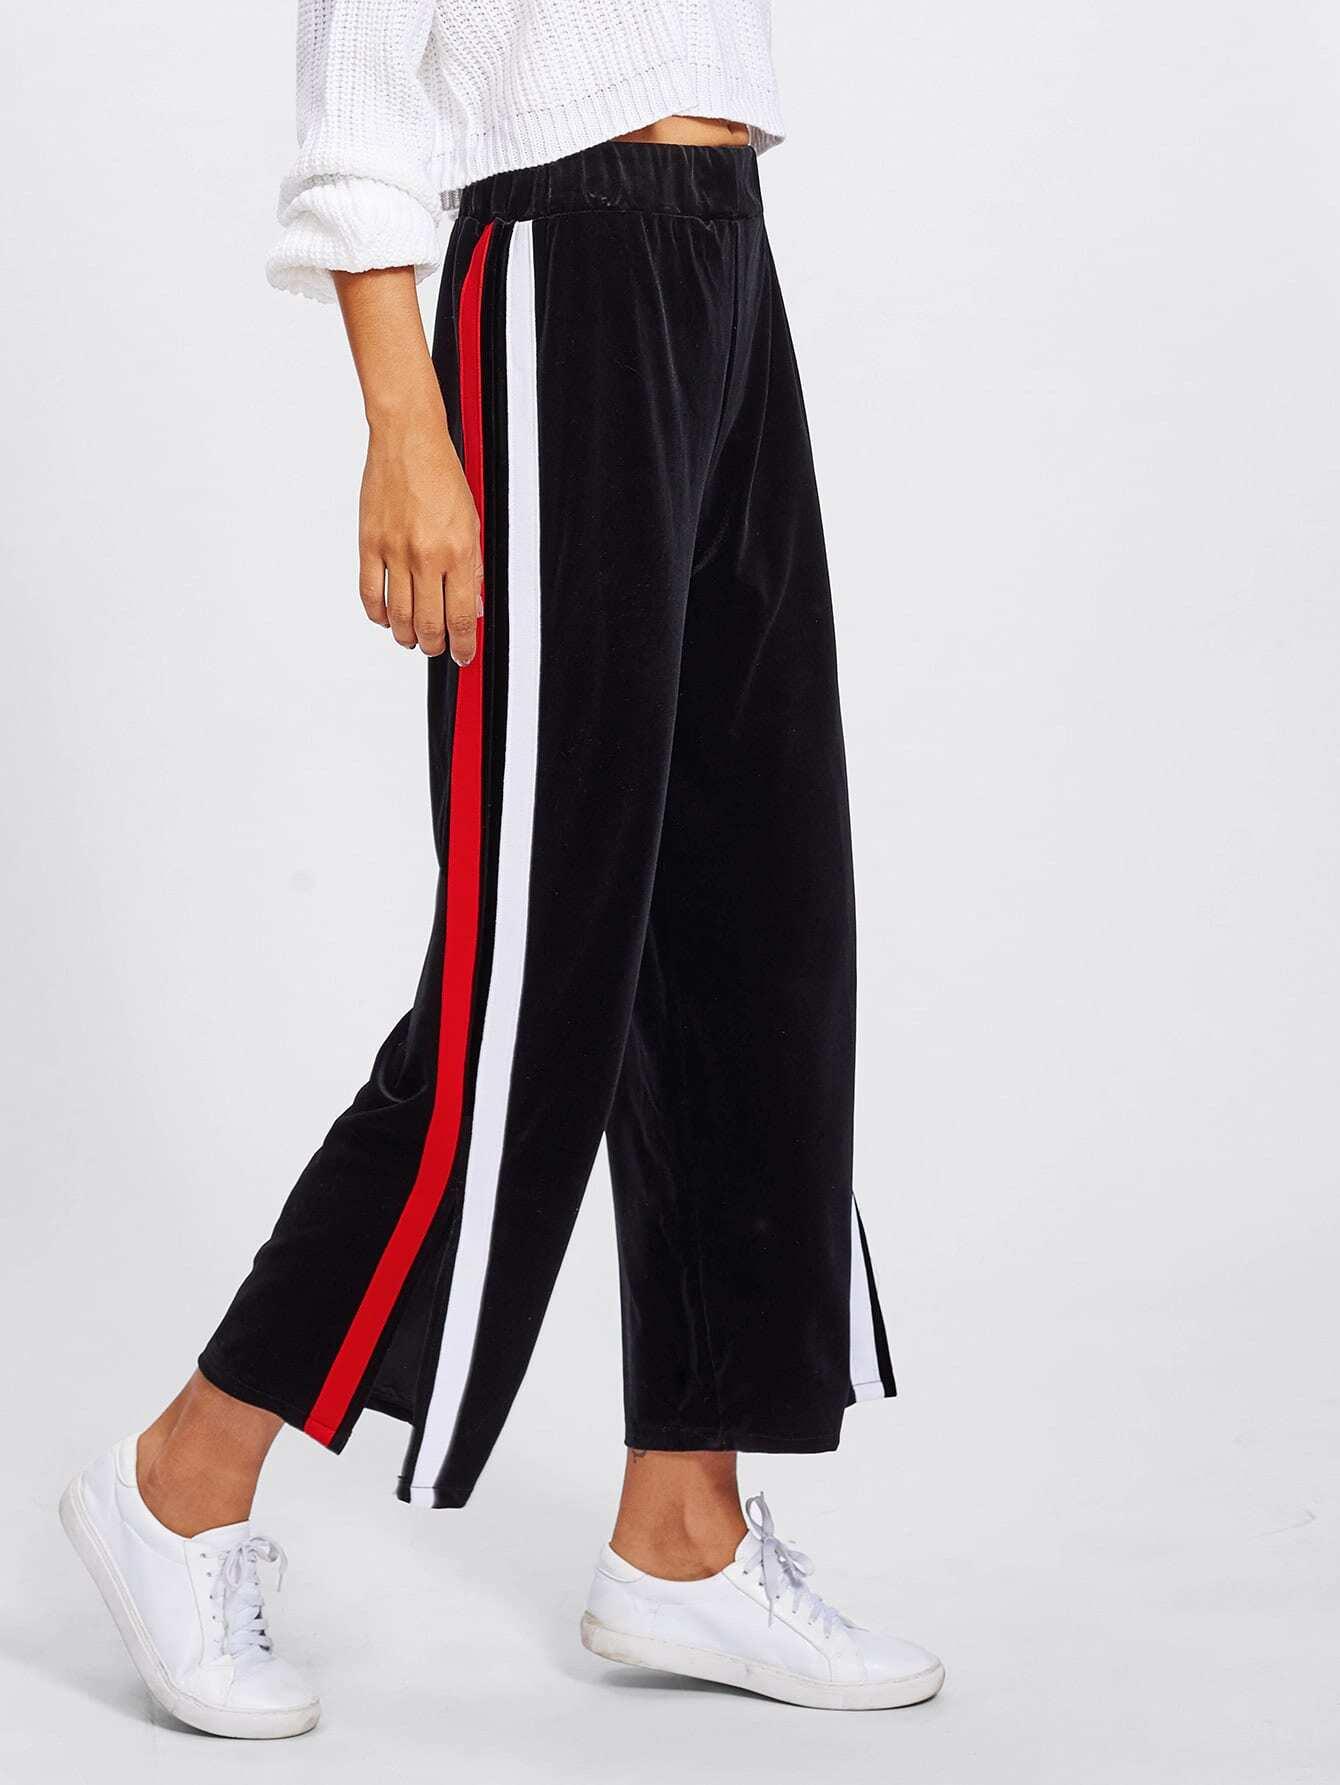 Pantalones anchos con bandas y aberturas laterales | ROMWE